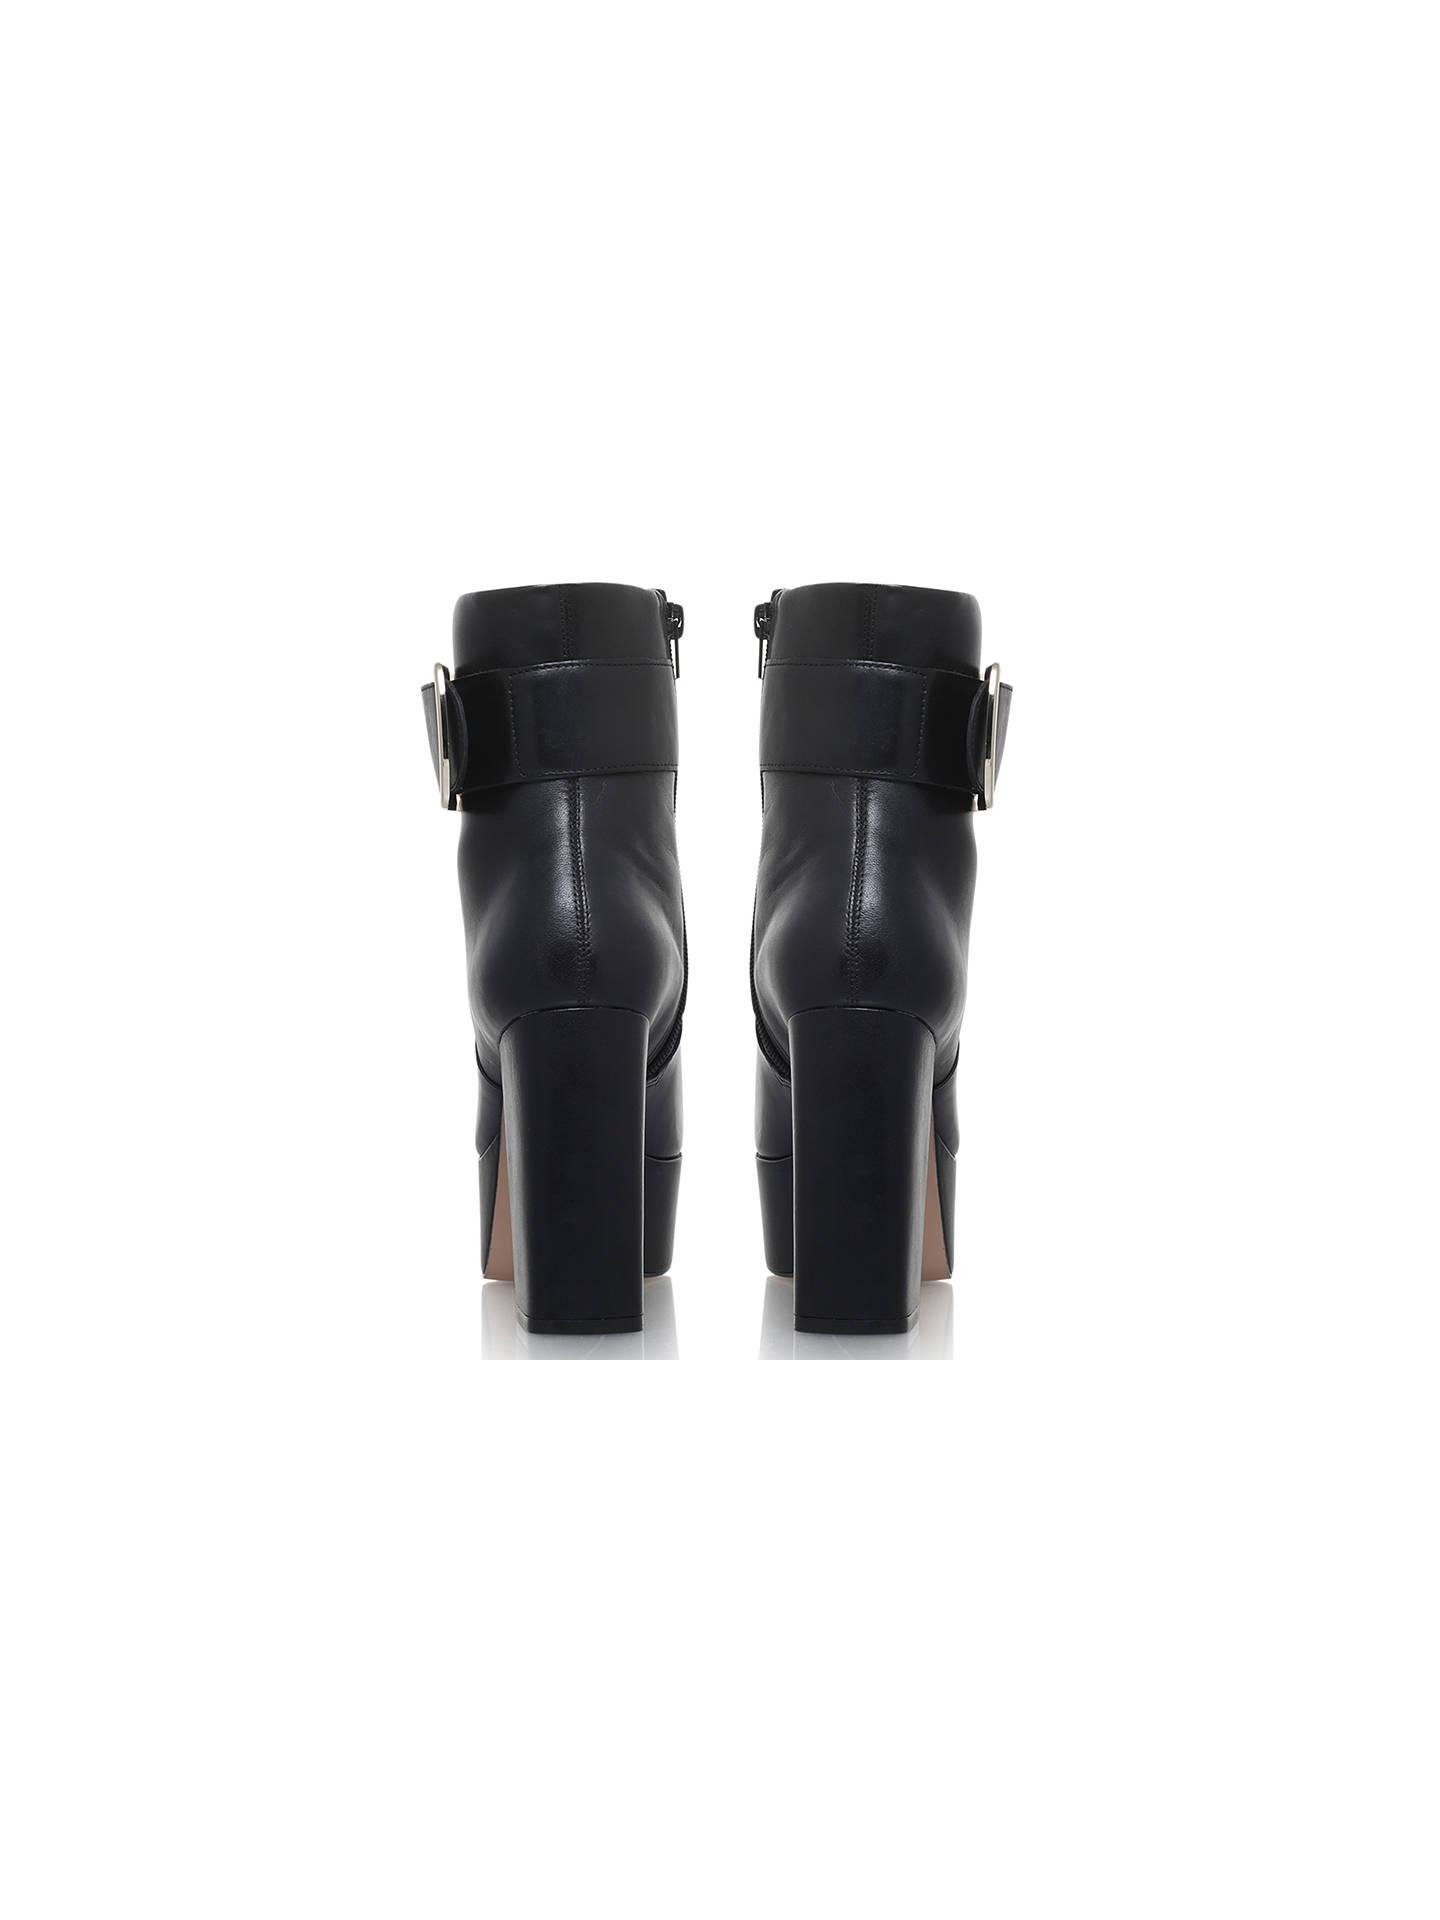 KG by Kurt Geiger Speed Chain Detail Trim Ankle Boots